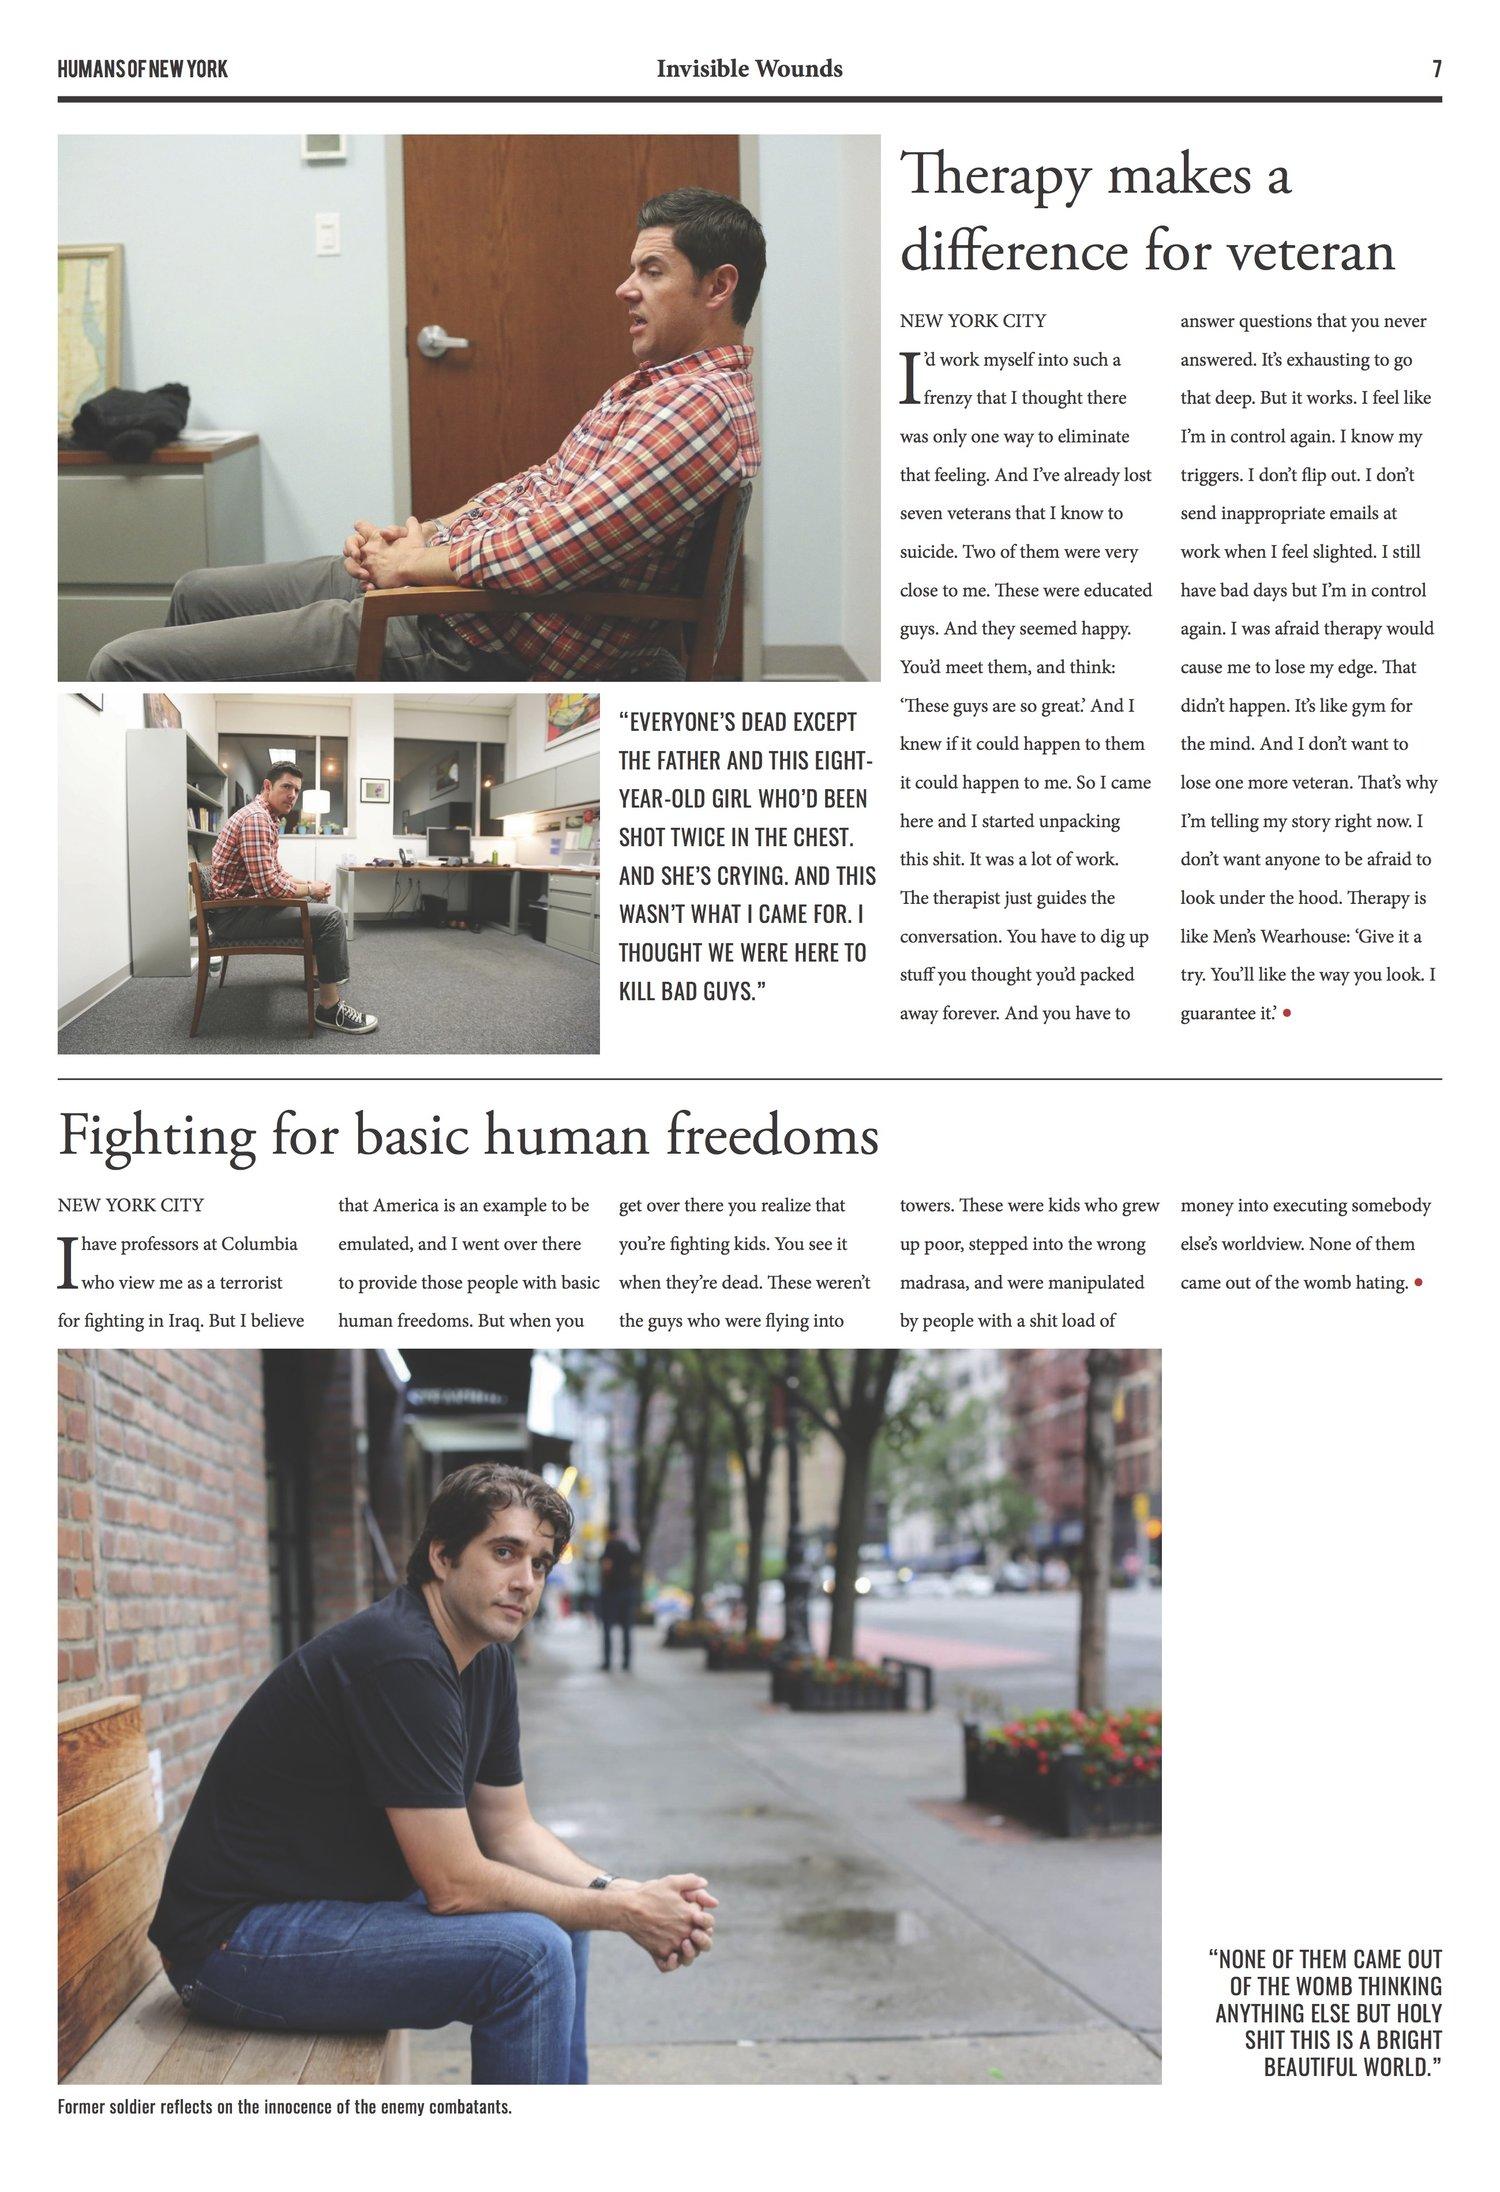 482Bulkeley_HONYNewspaper6pg7.jpg